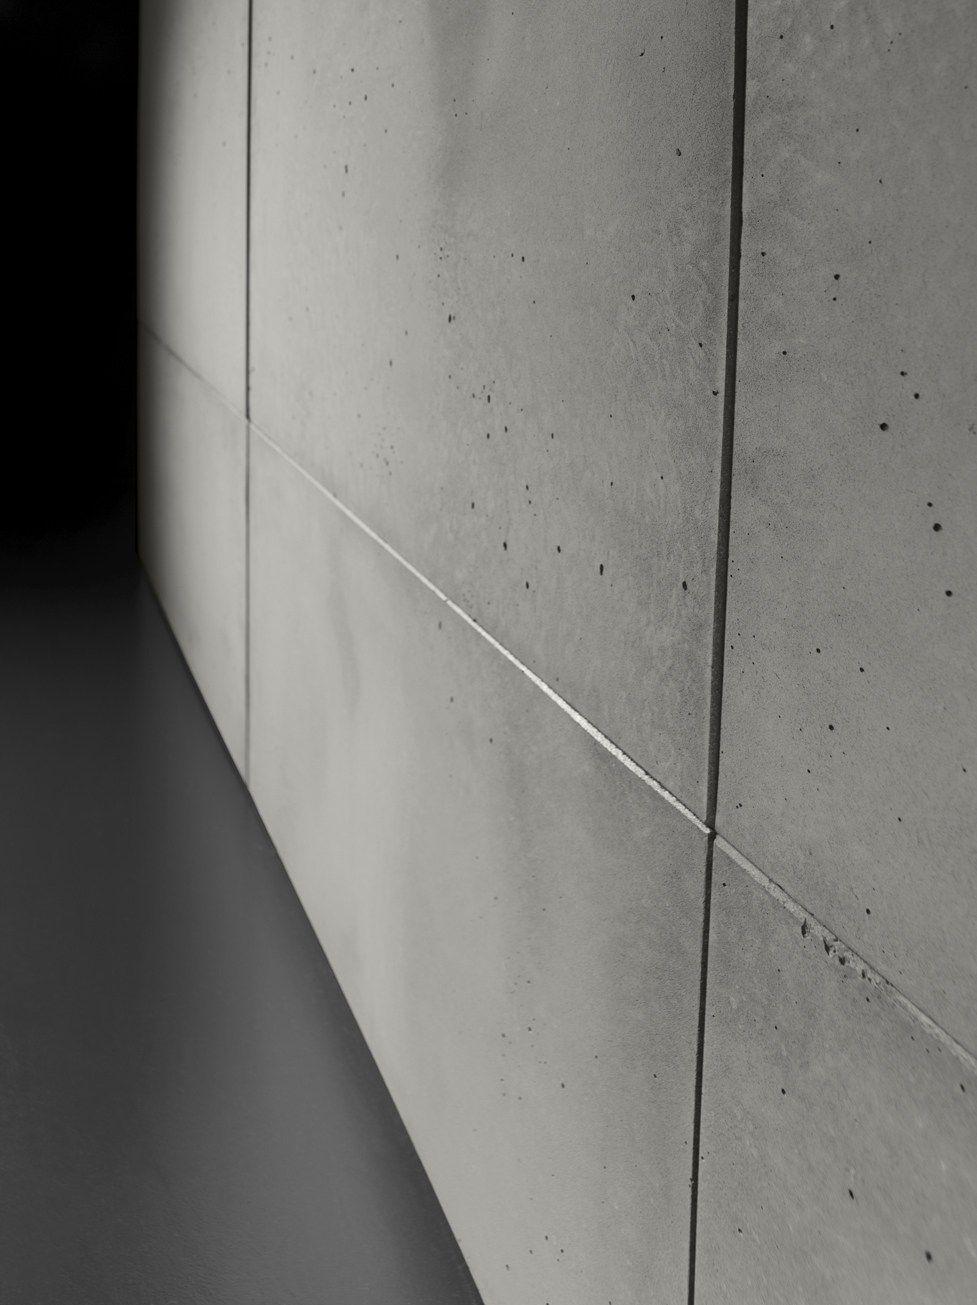 Indoor Smooth Concrete Wall Tiles Cimento Liscio Cement Door Panel By Sai Industry Srl Concrete Wall Concrete Wall Panels Cement Walls